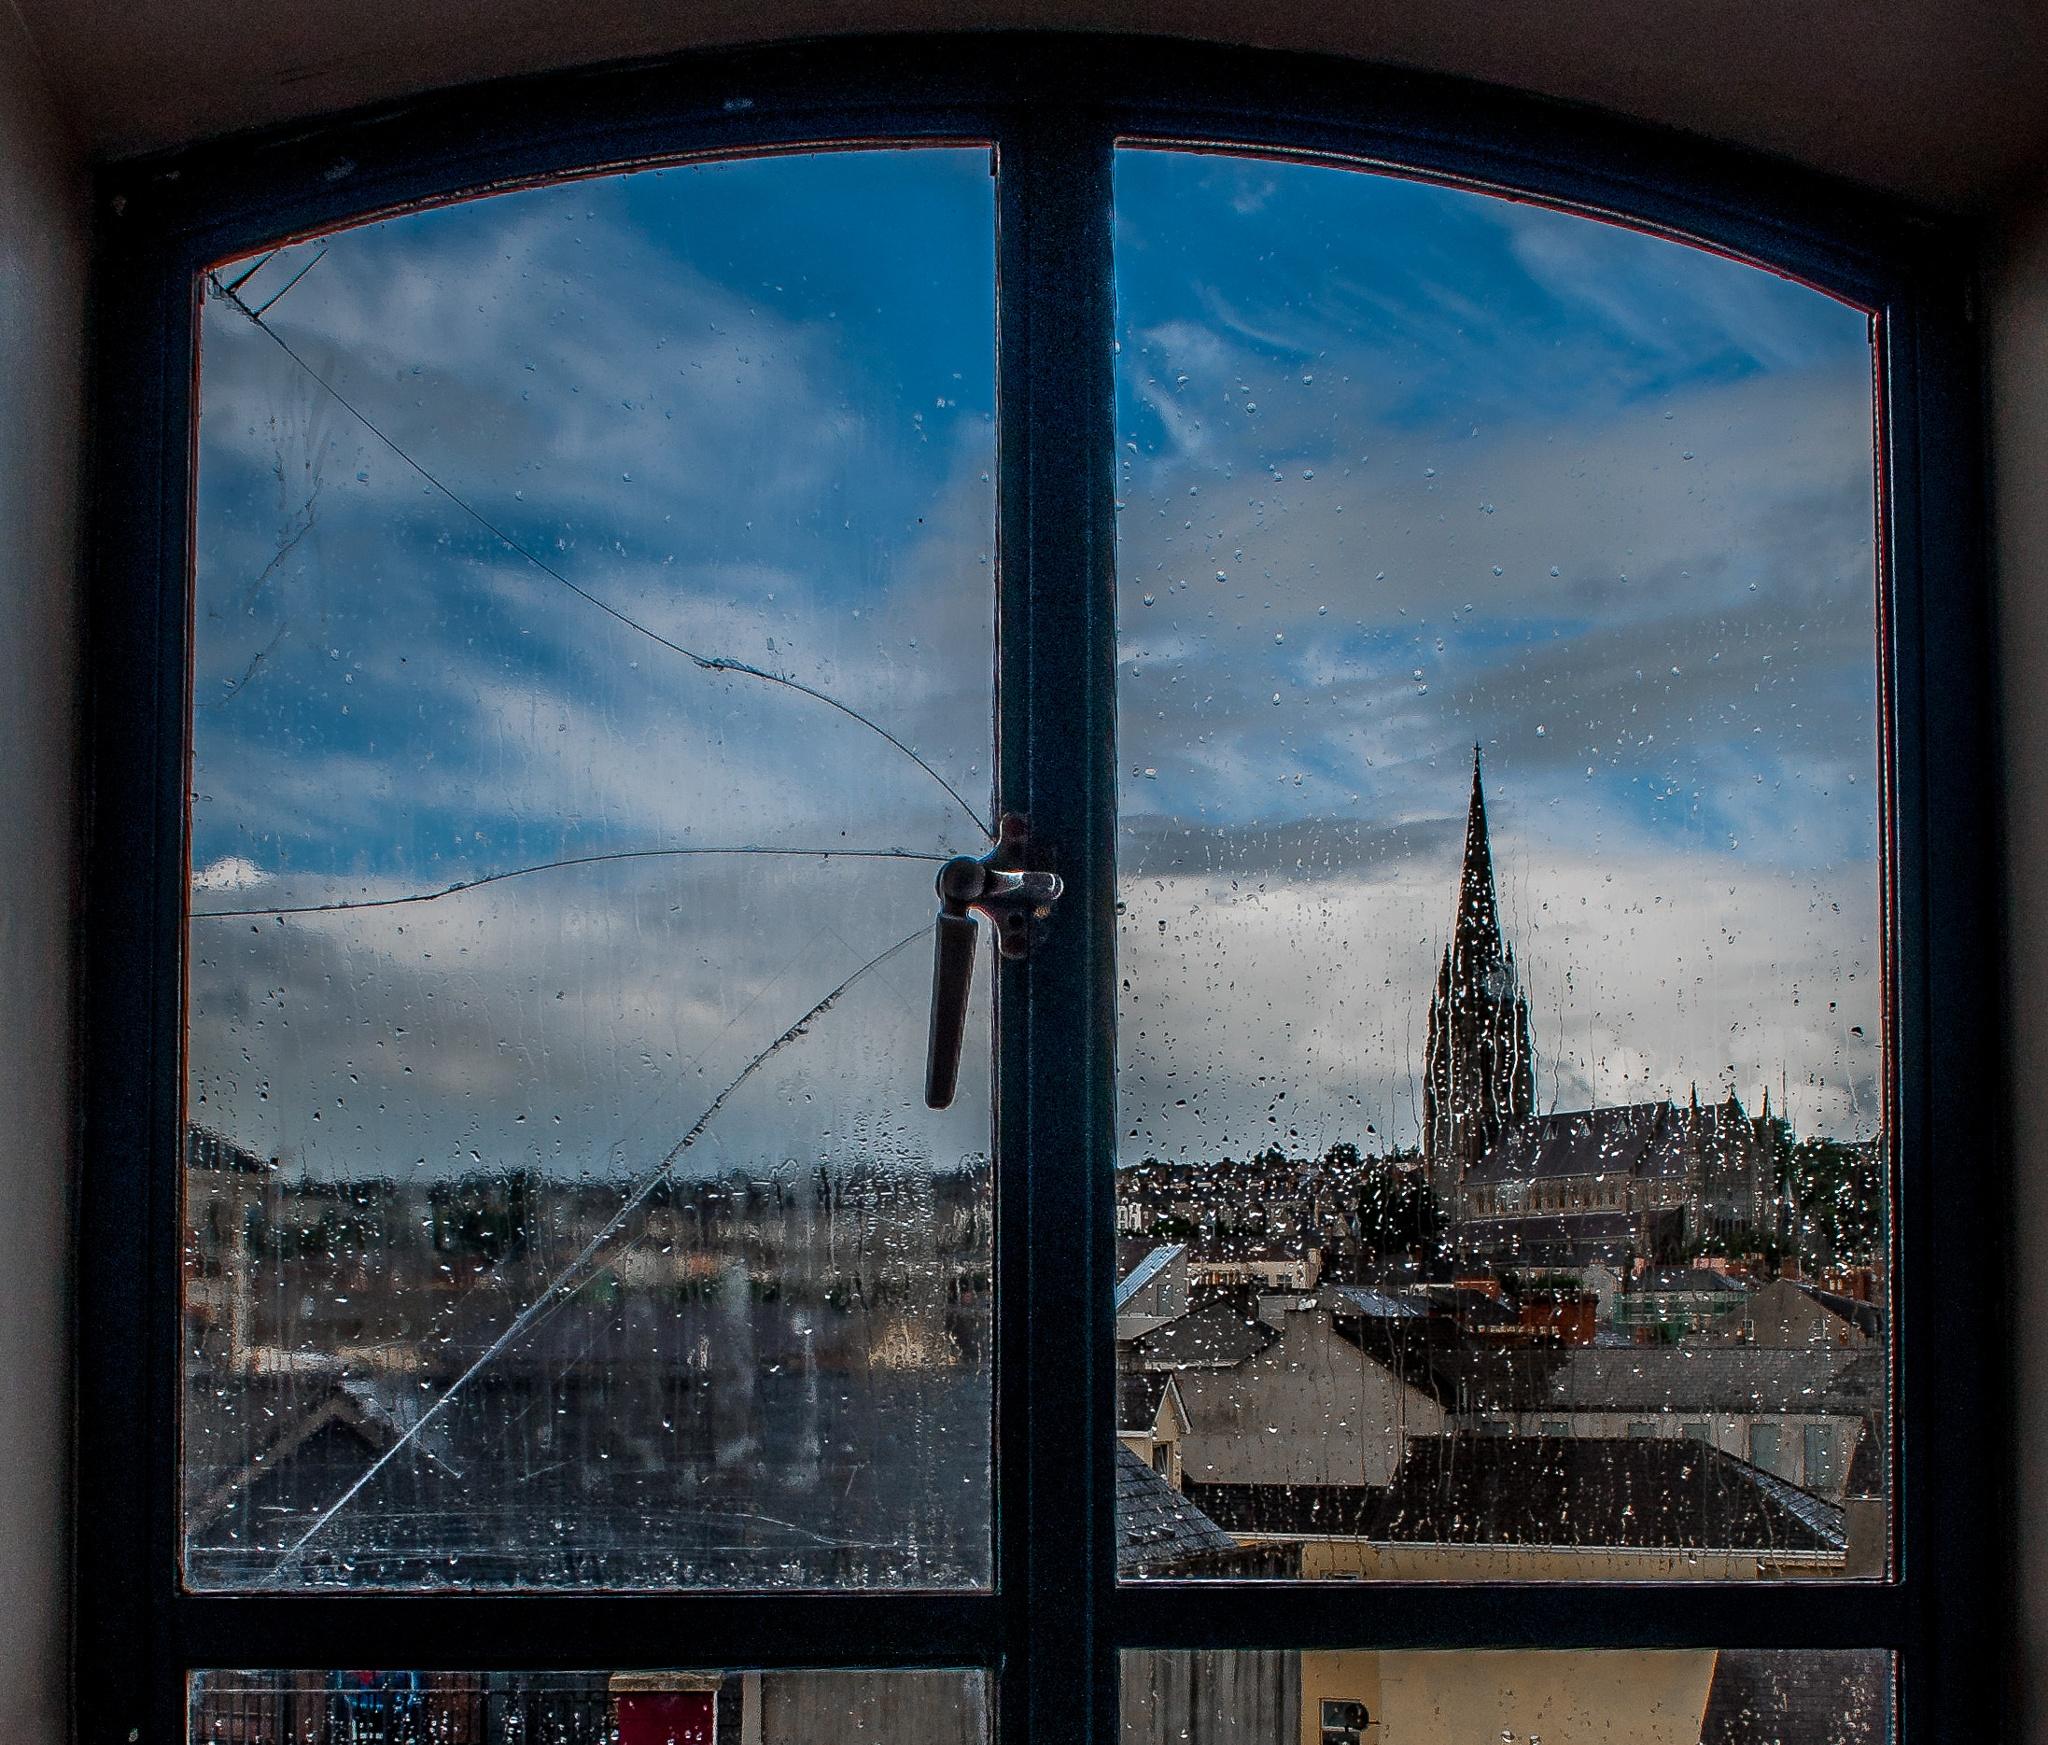 Window by donato rondini